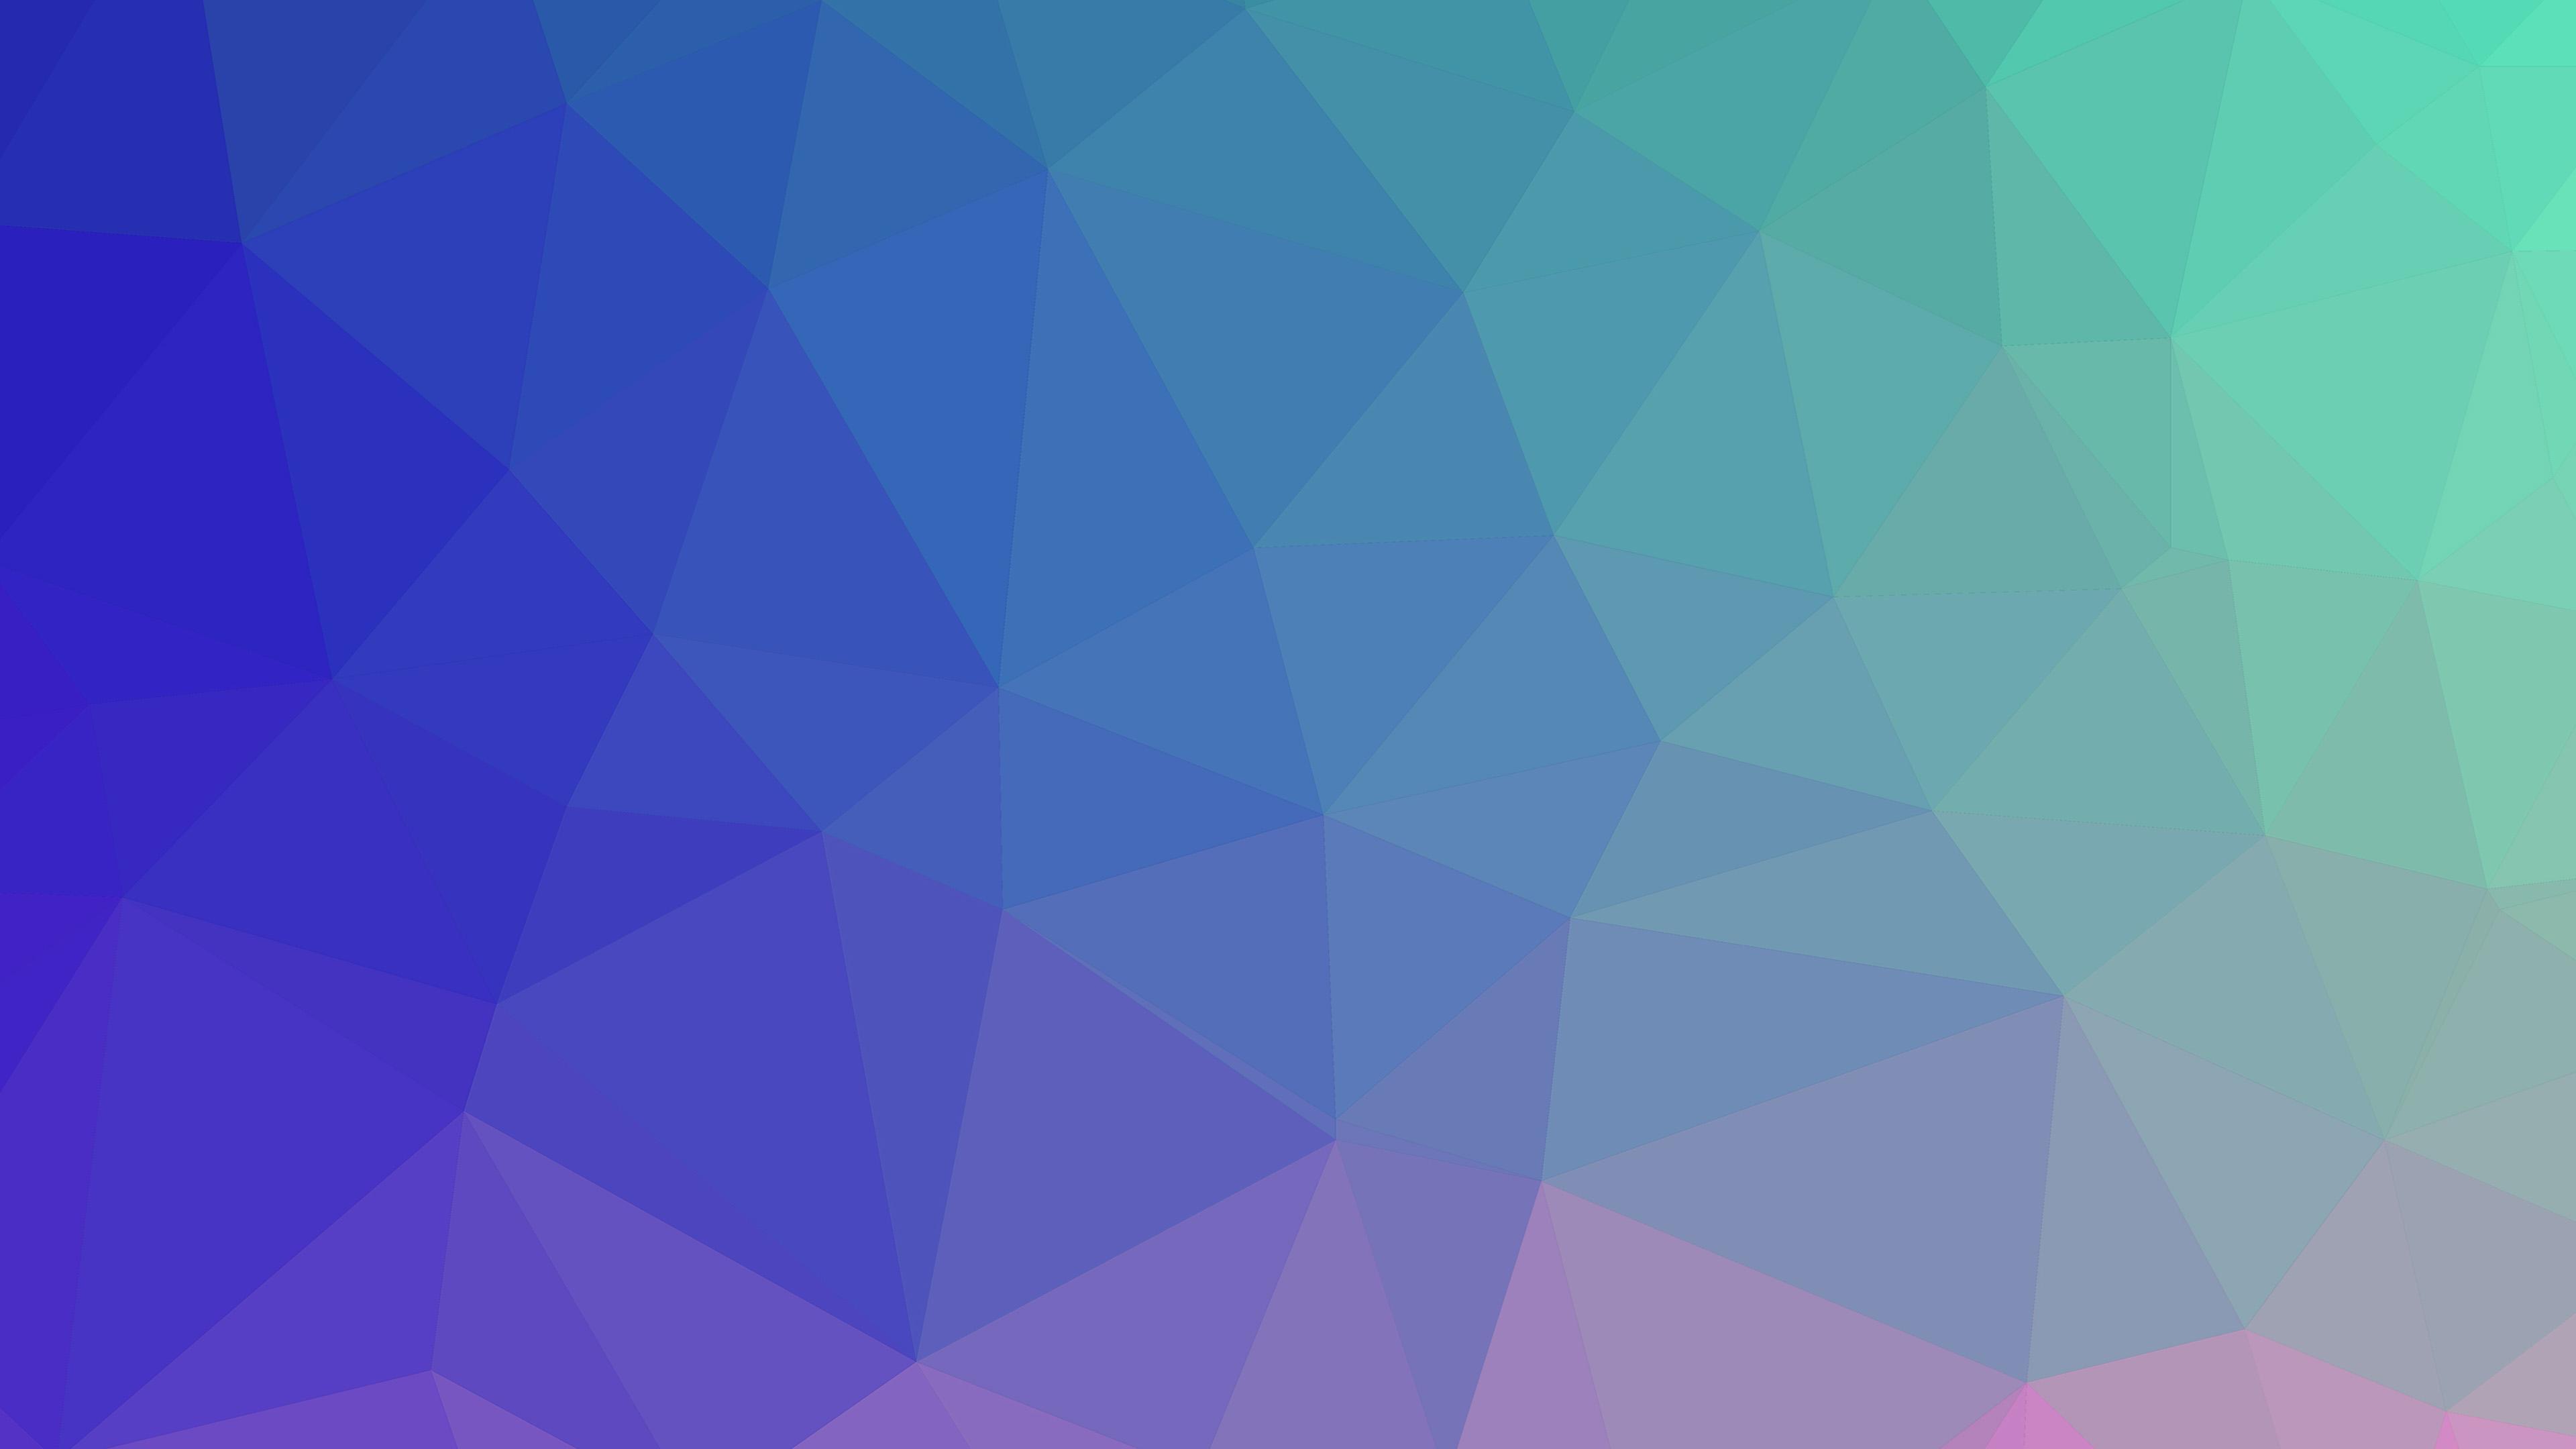 Vk64 Samsung Galaxy Polyart Pastel Pattern Wallpaper